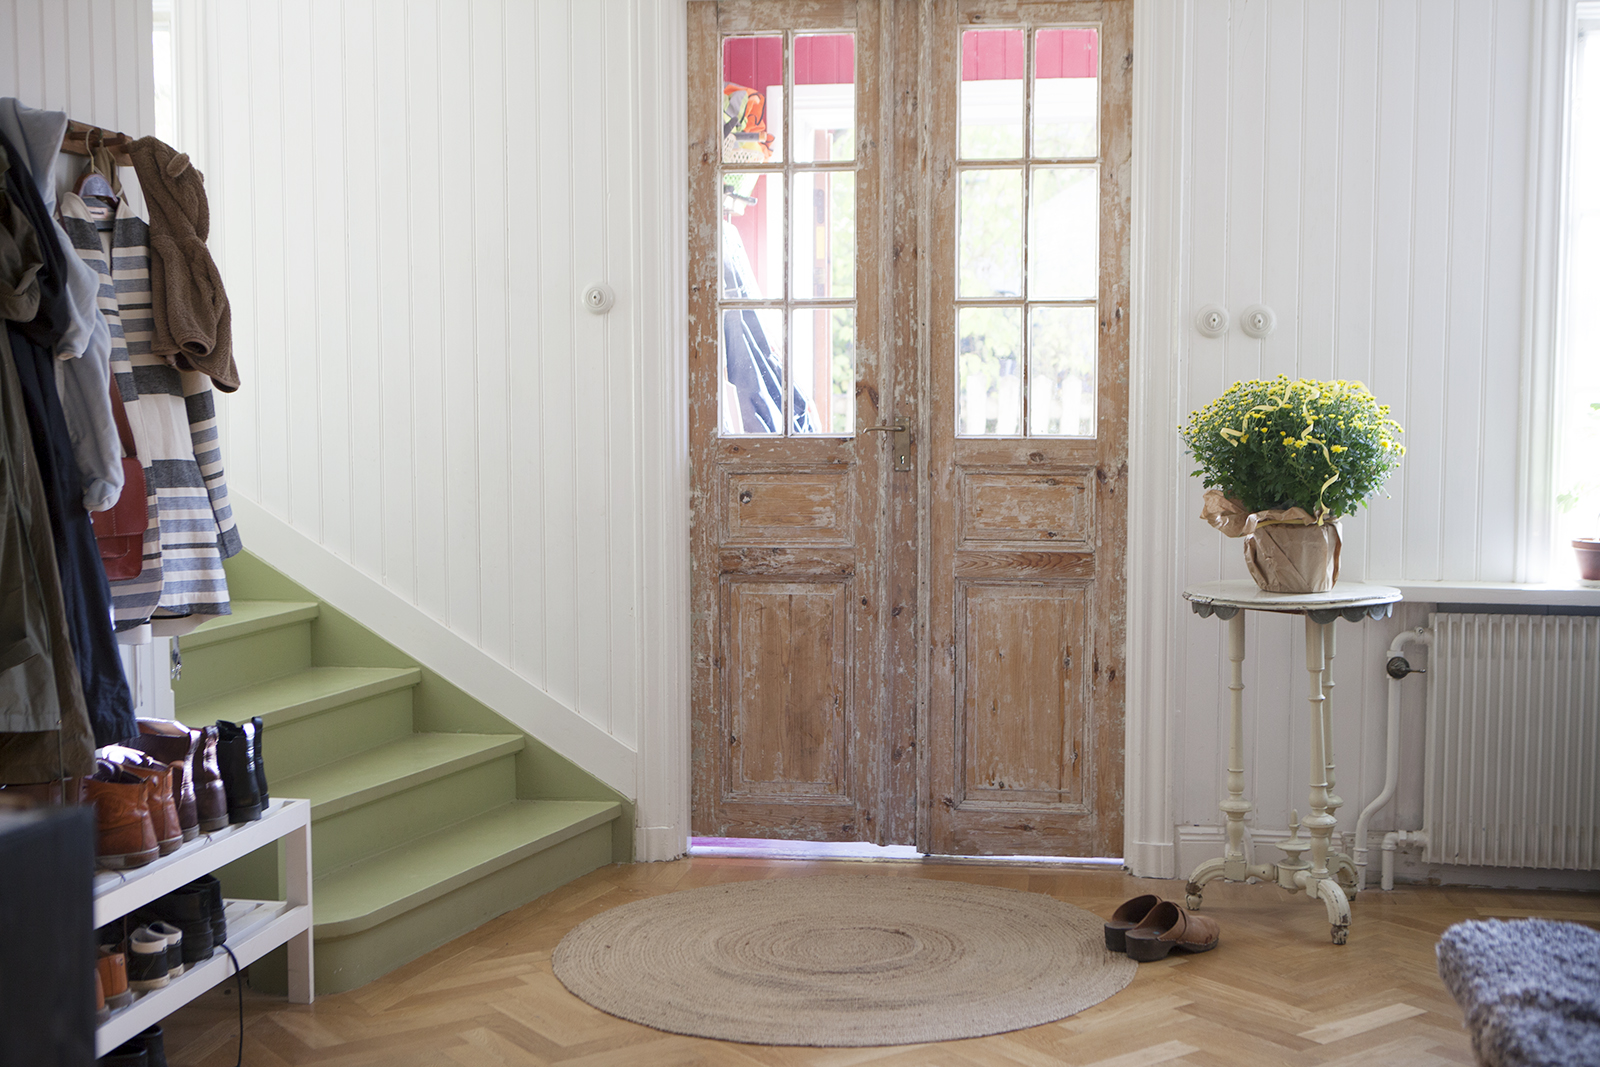 Hall i Amelies hus. Inredning, interior, snygga hallar.